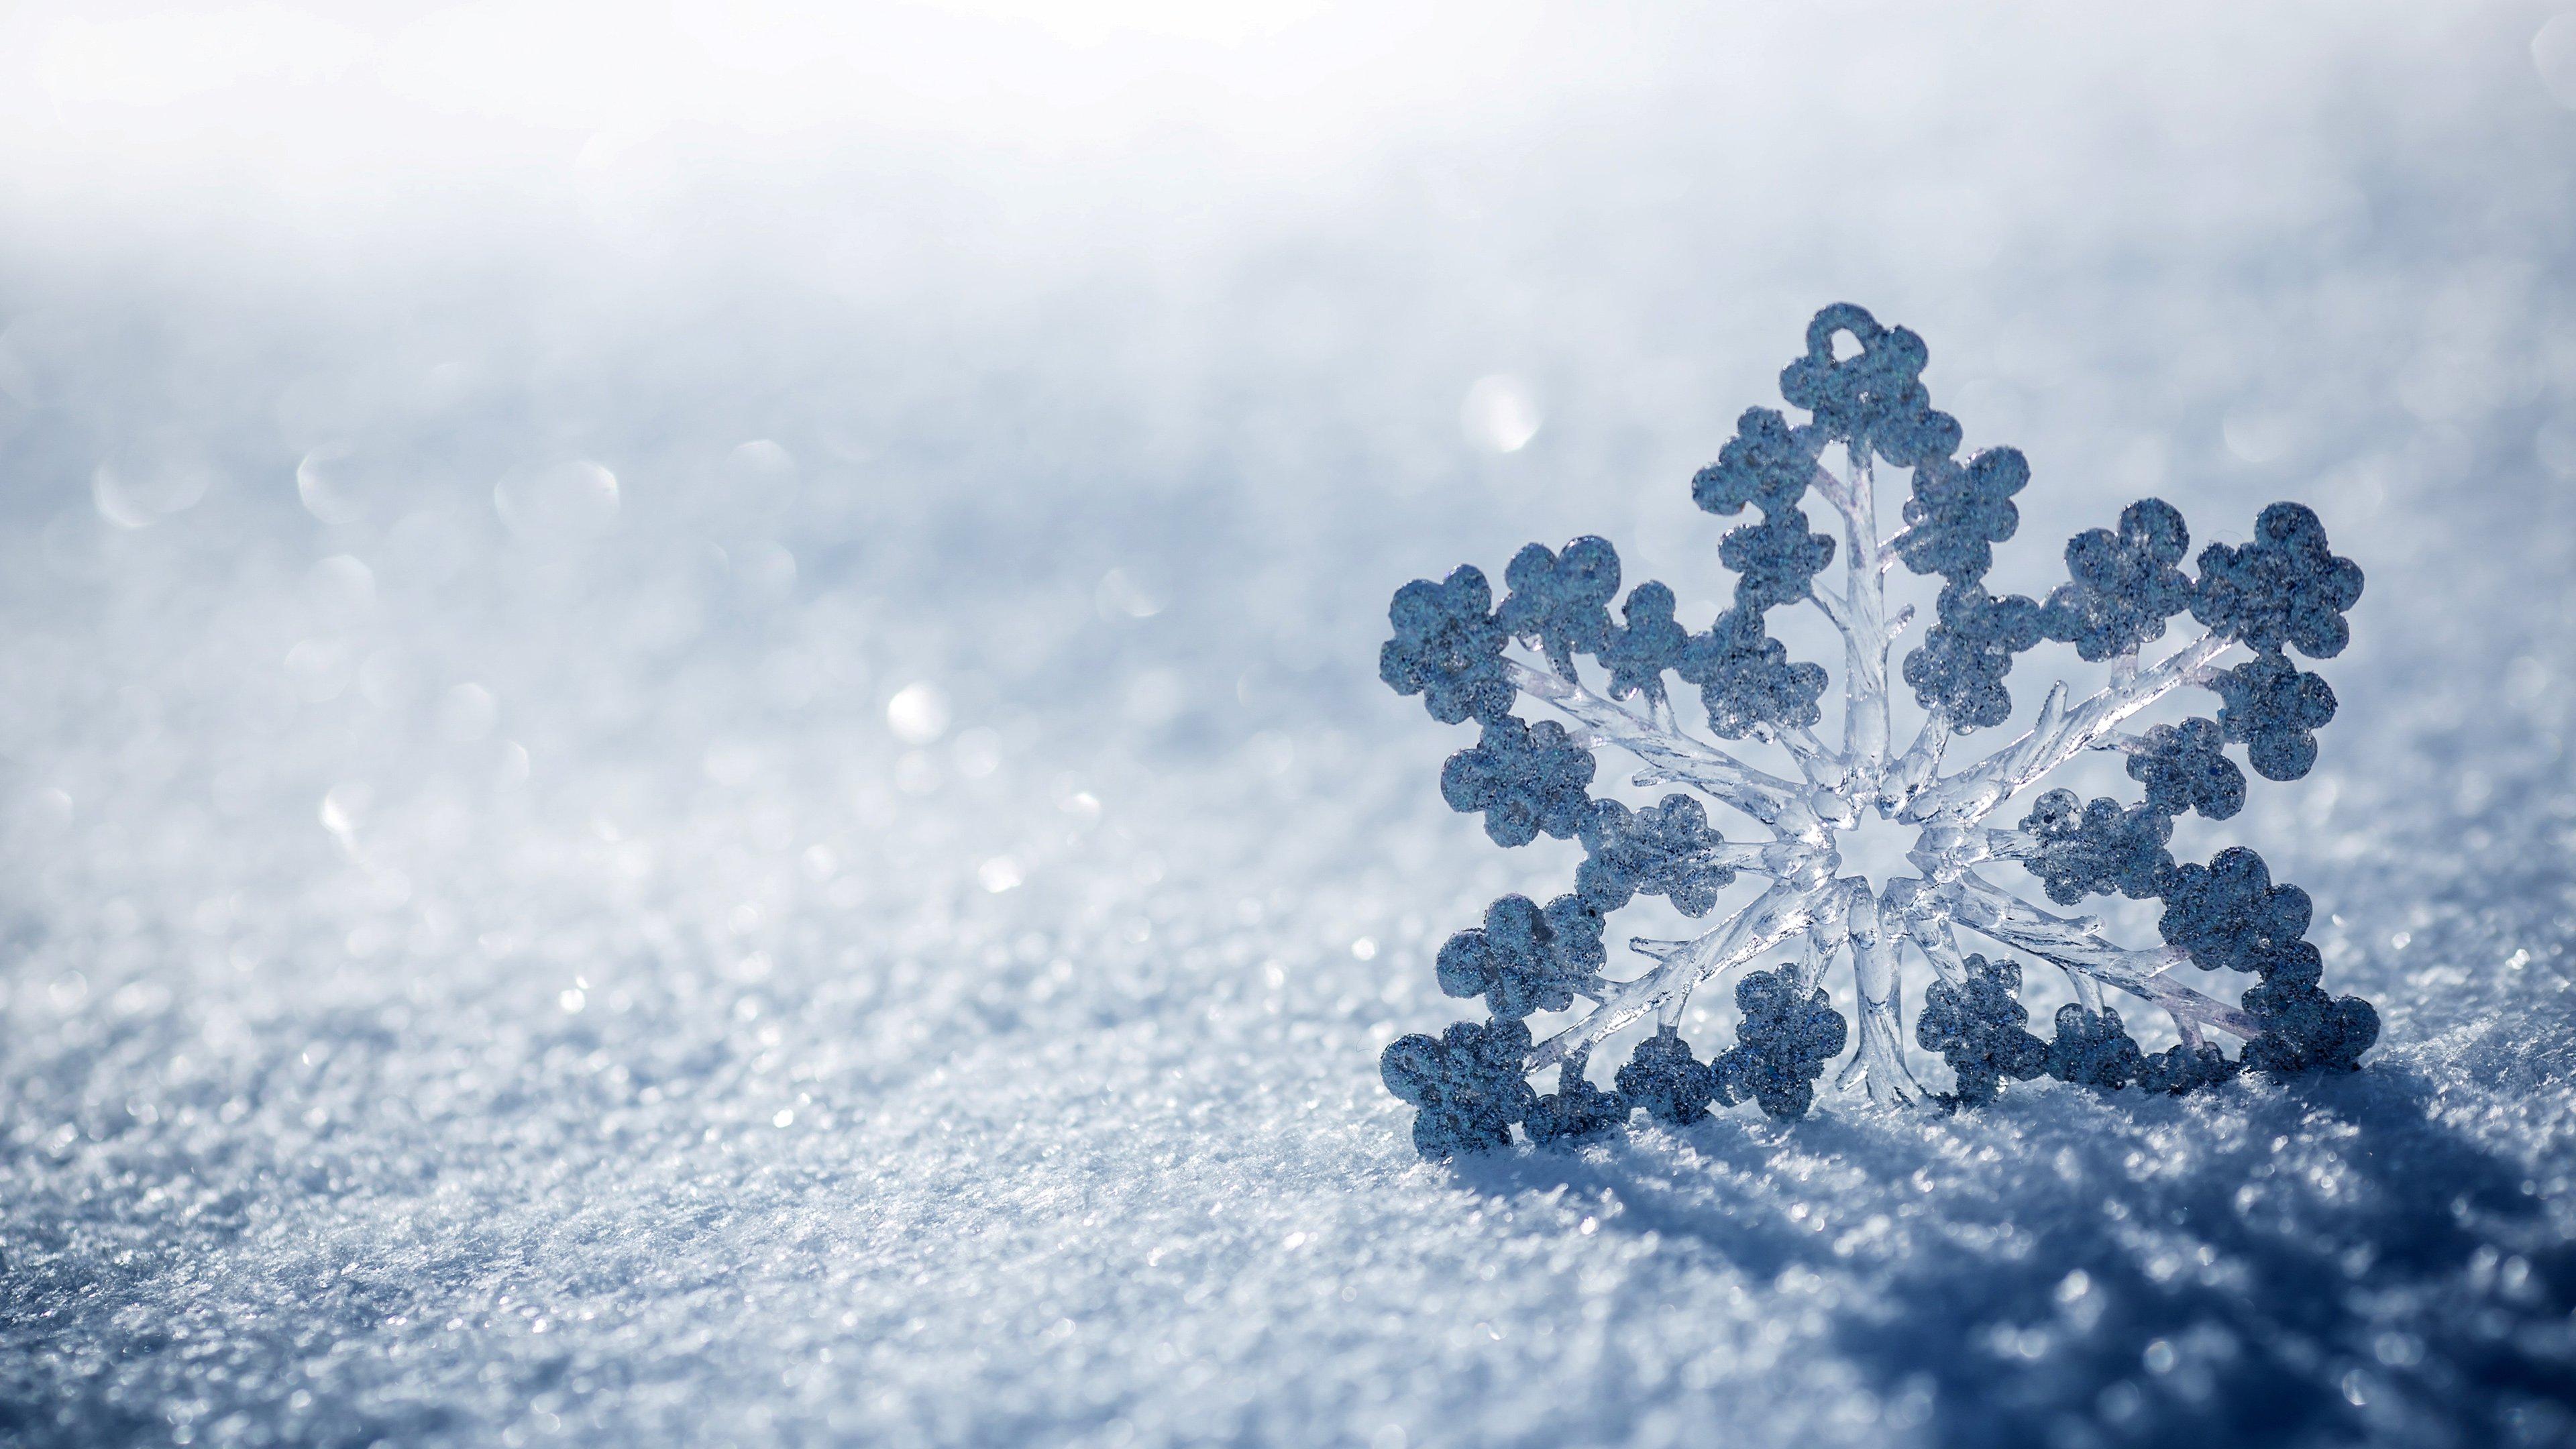 nature snow winter snowflake christmas bokeh wallpaper